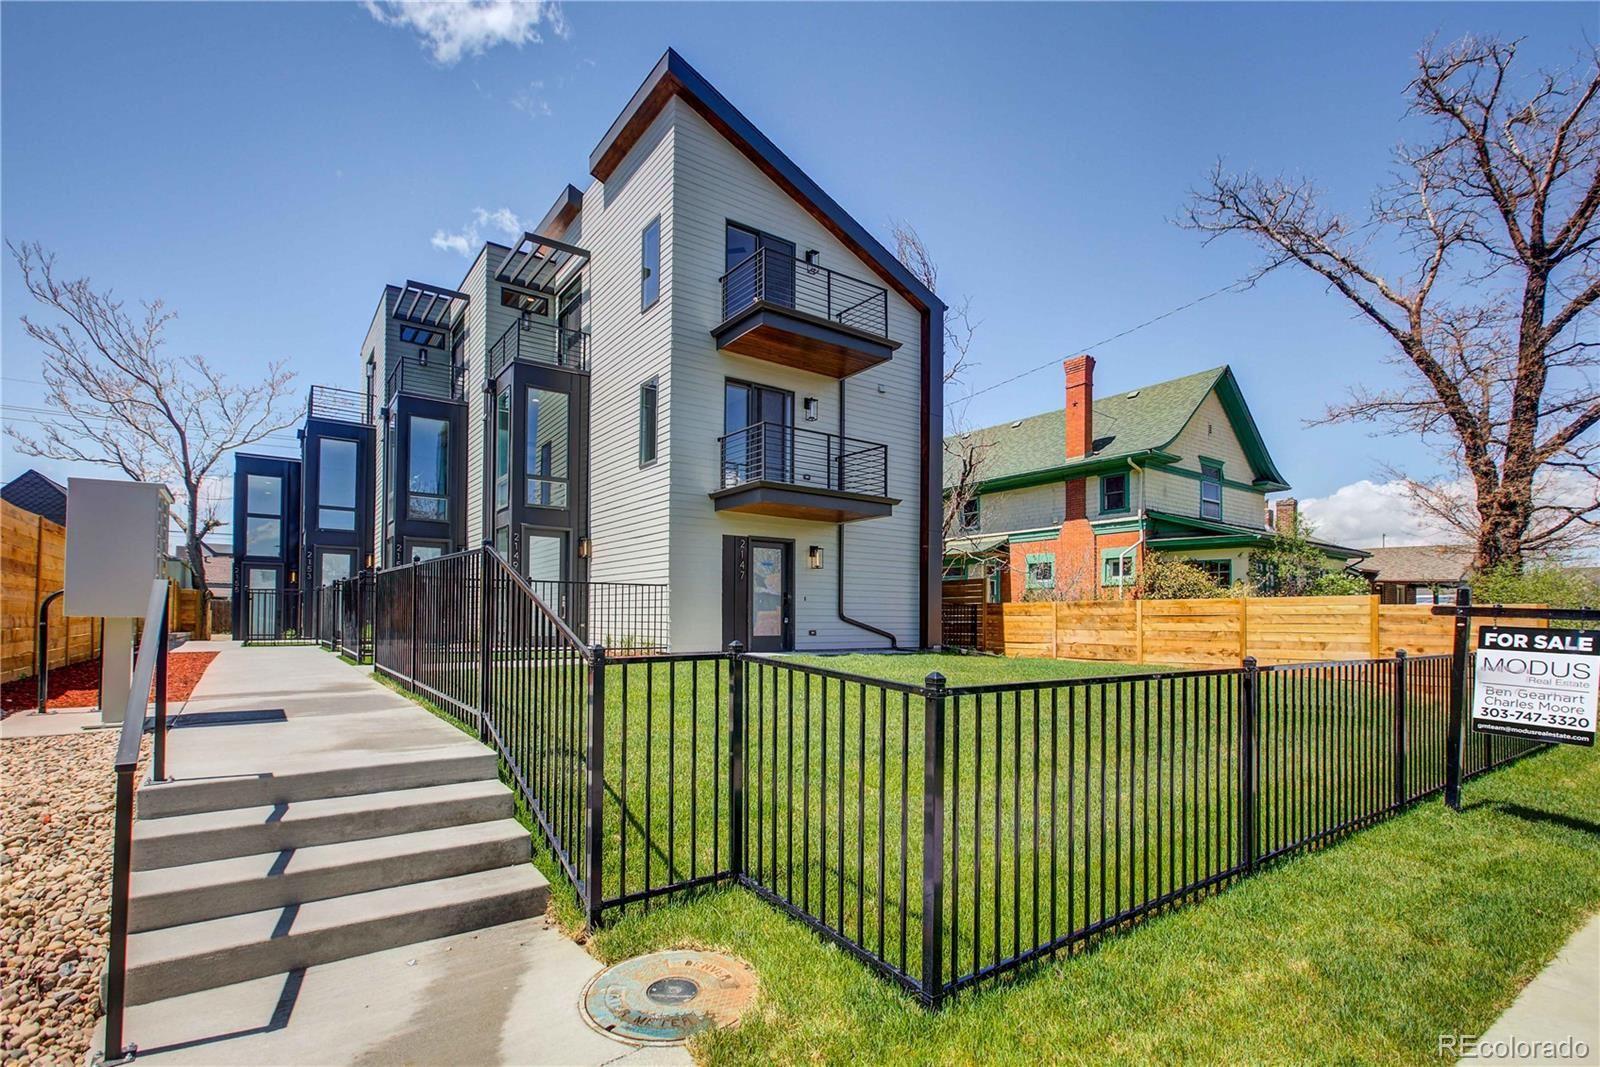 2153 S Acoma Street, Denver, CO 80223 - #: 5696060